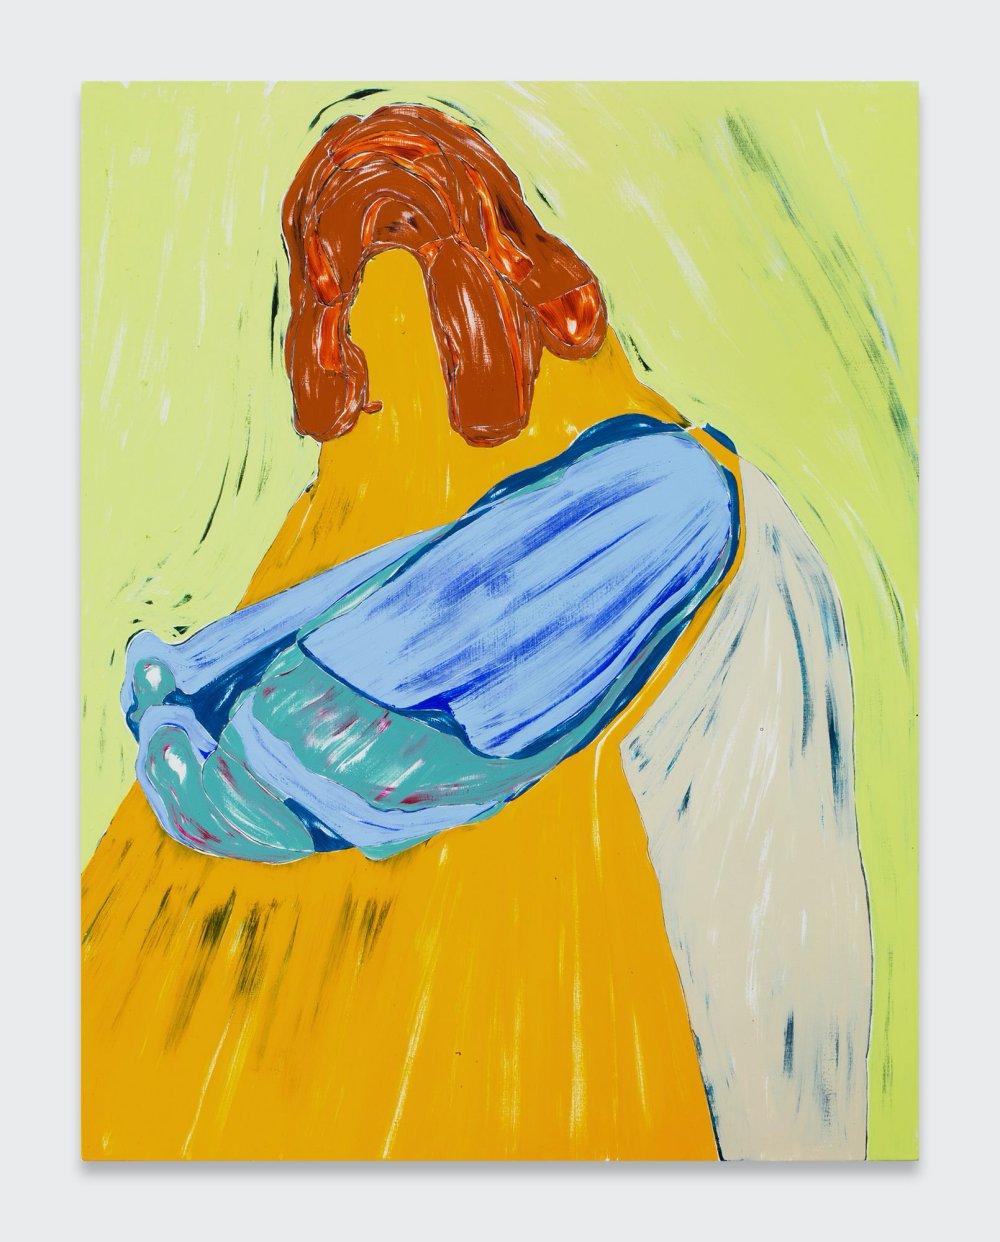 Big Yellow Self-Portrait